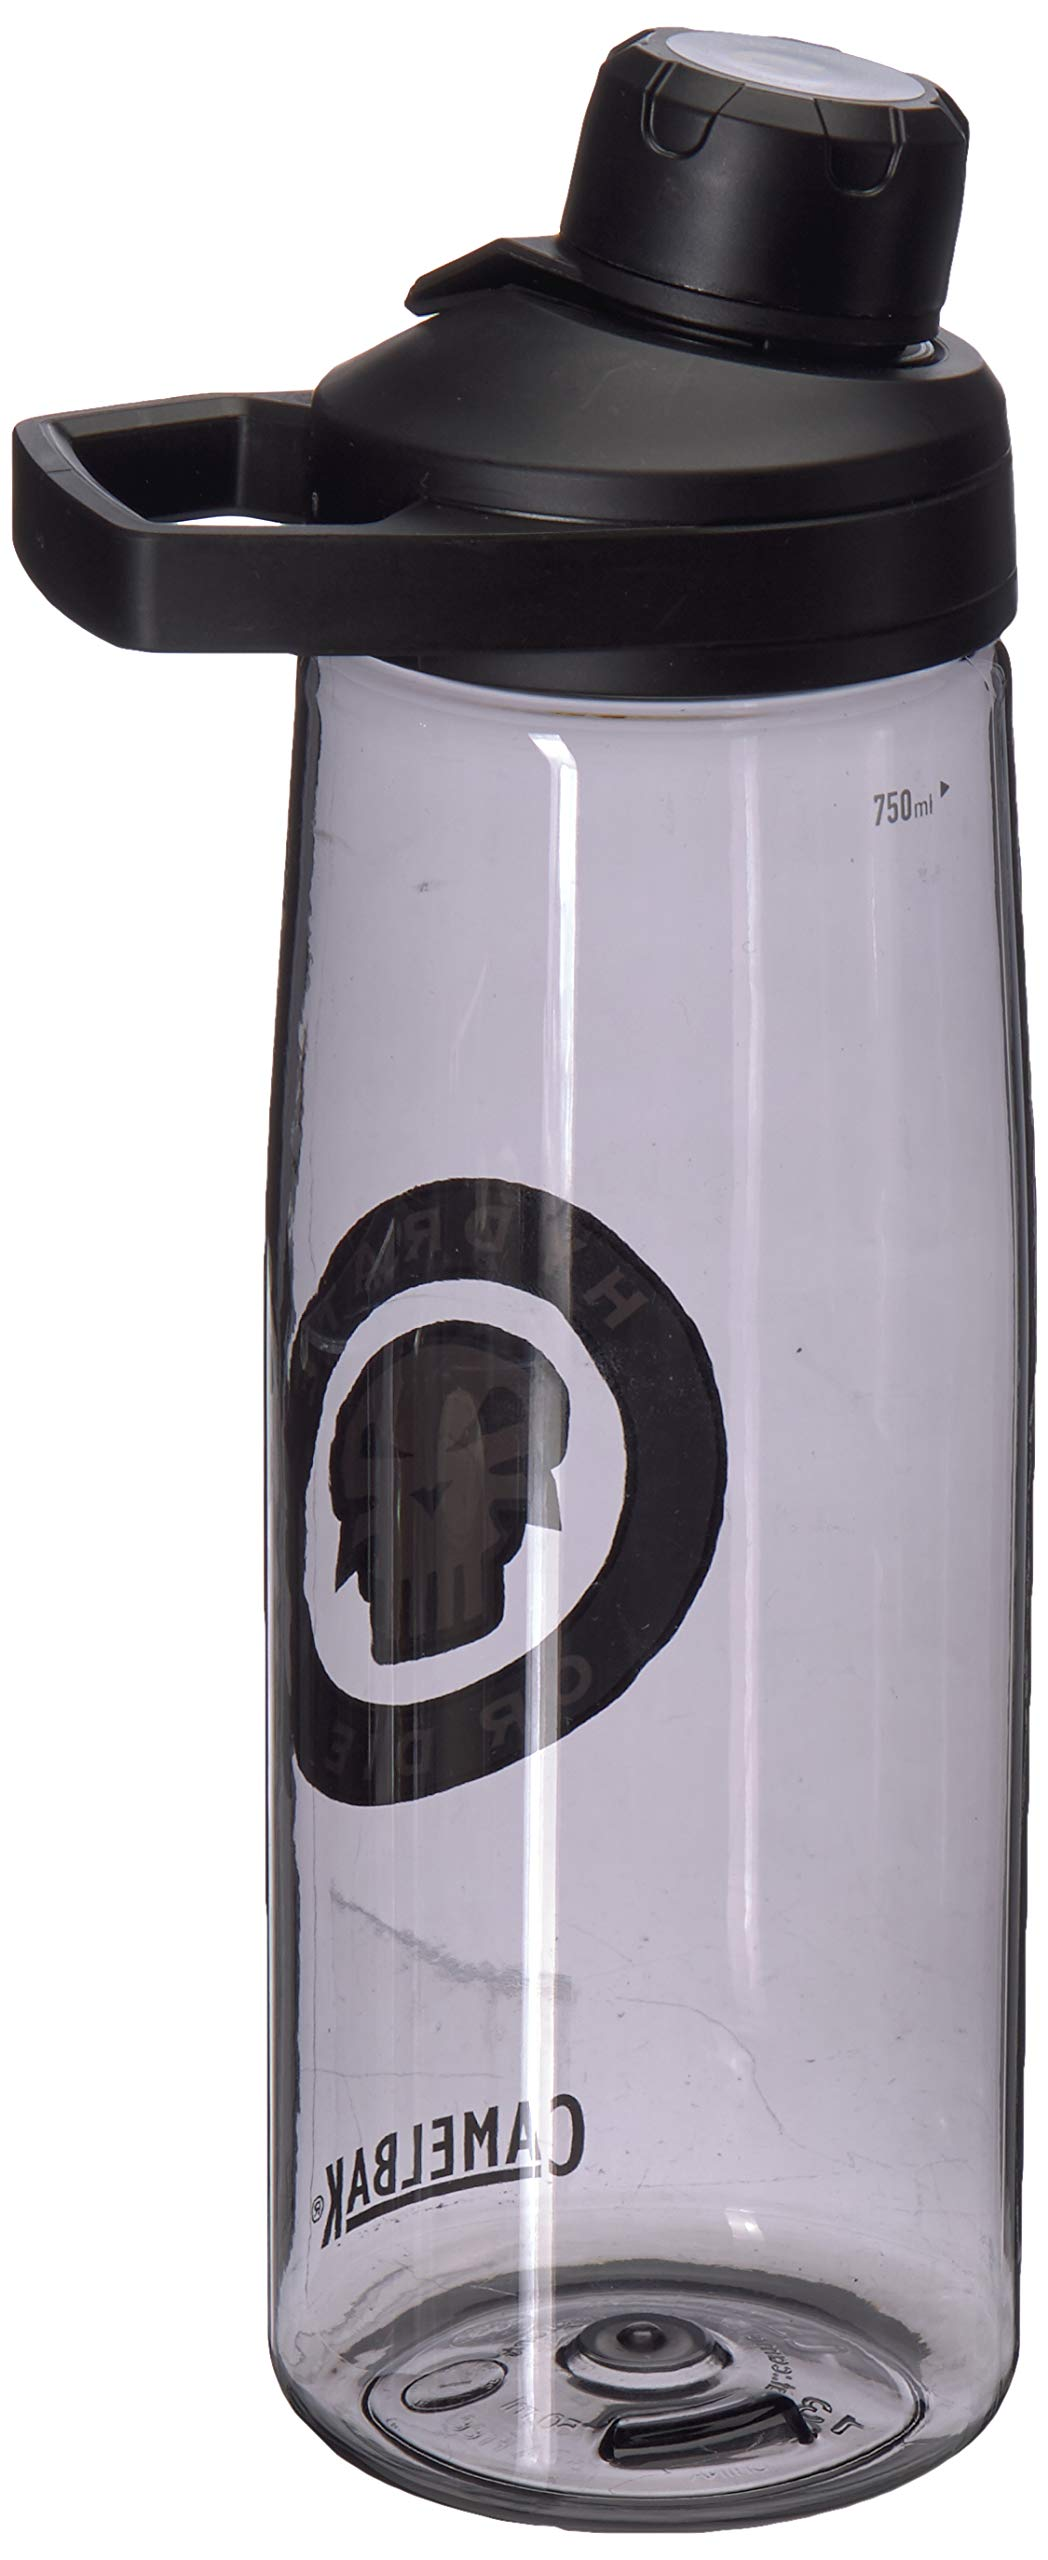 CamelBak 1512002075 Water Bottle, Charcoal, 0.75 L